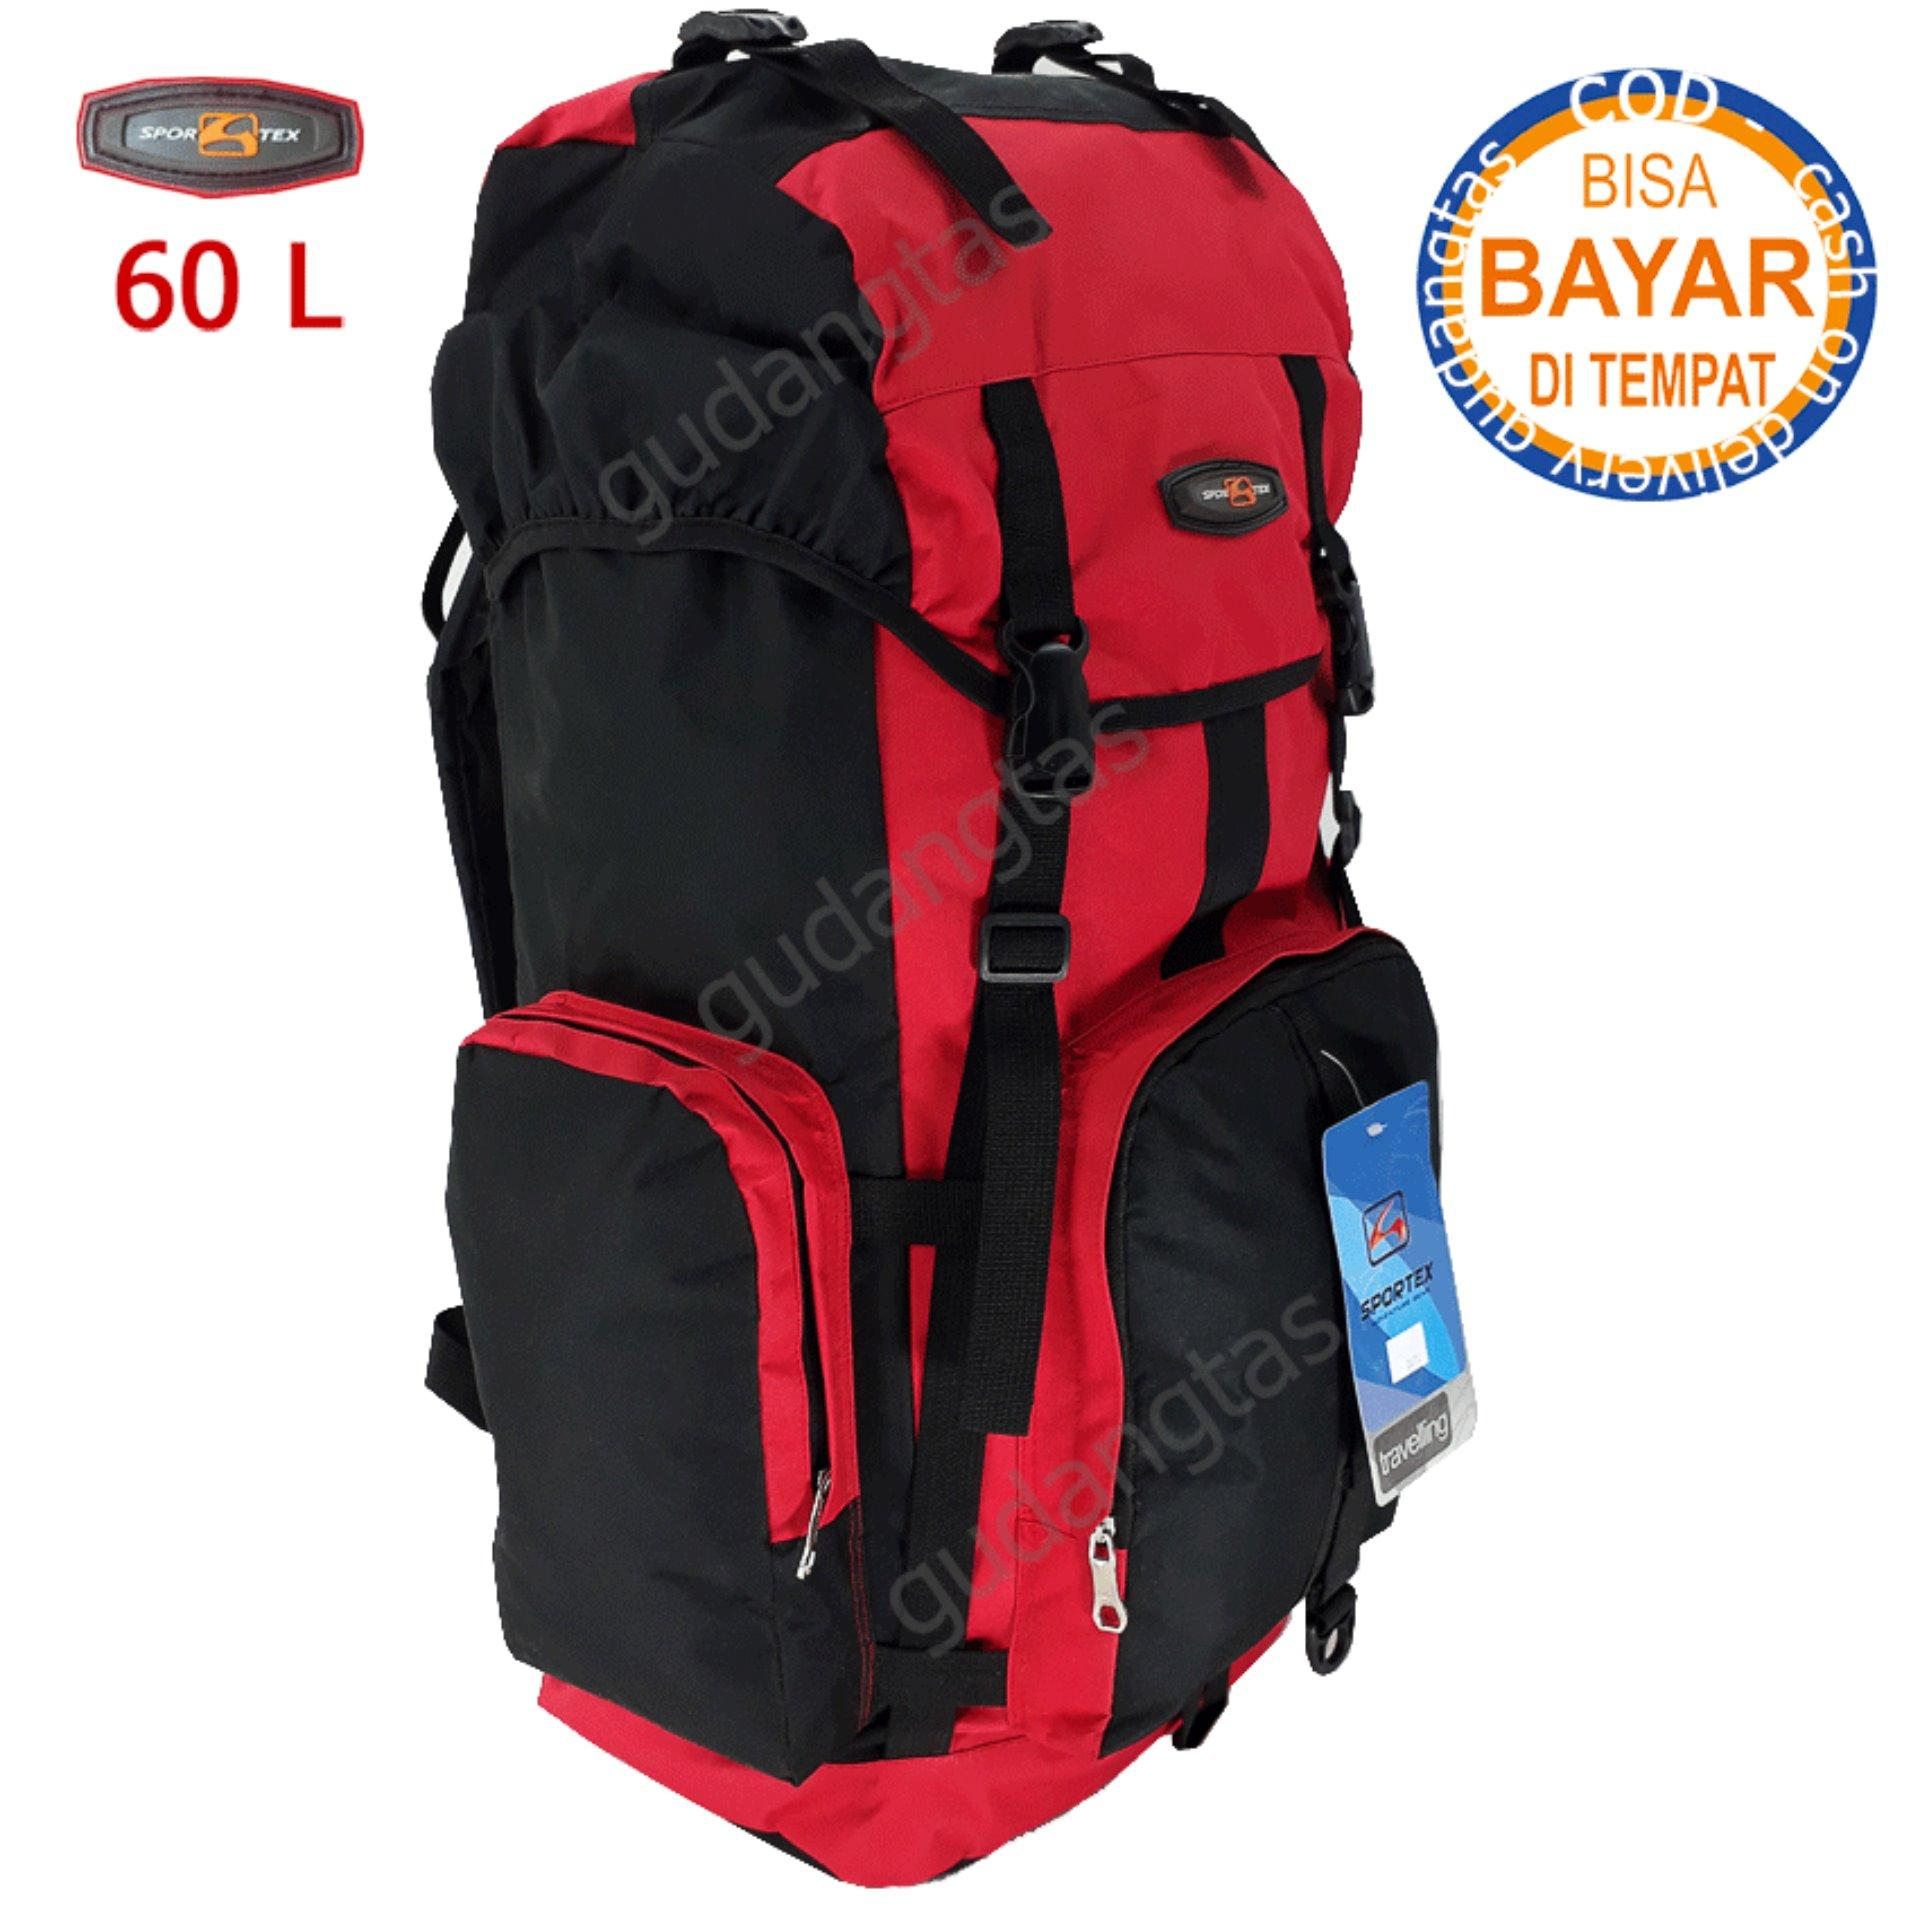 Sportex Tas Gunung Tas Keril Tas Carrier Tas Camping Tas Hiking 60L 04W4 Merah kombinasi Hitam